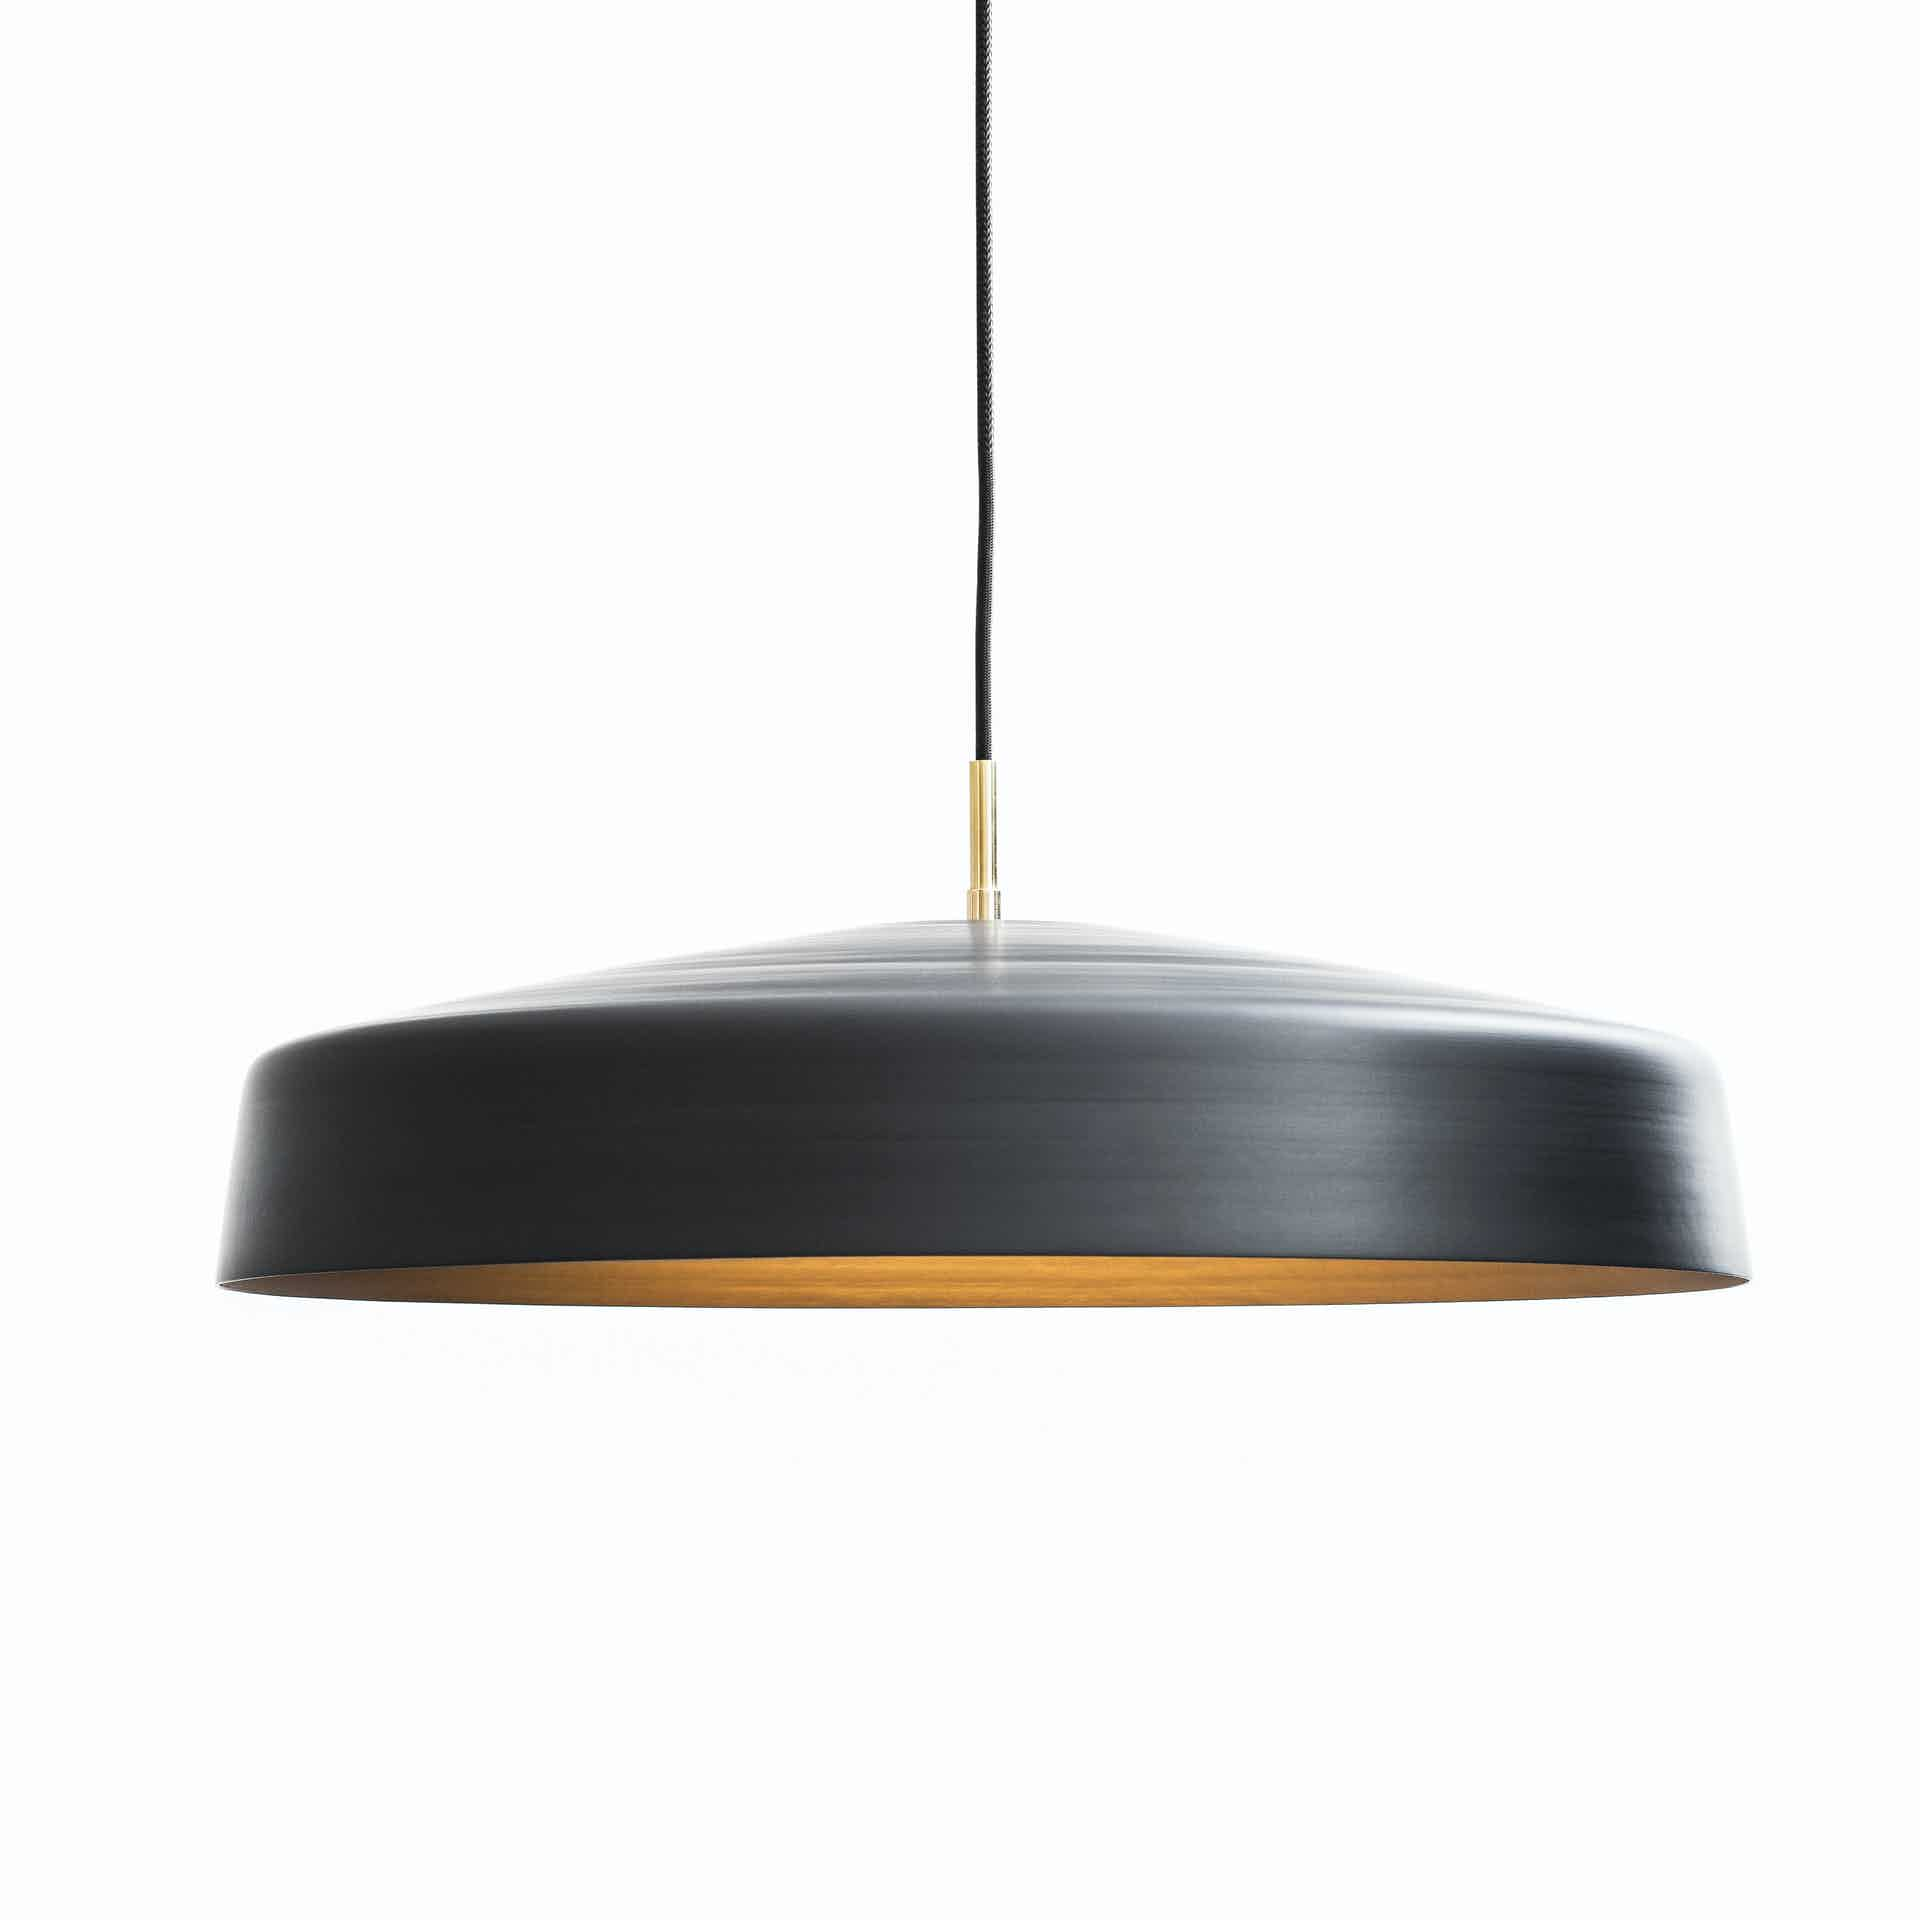 lambert & fils cliff dome lamp haute living